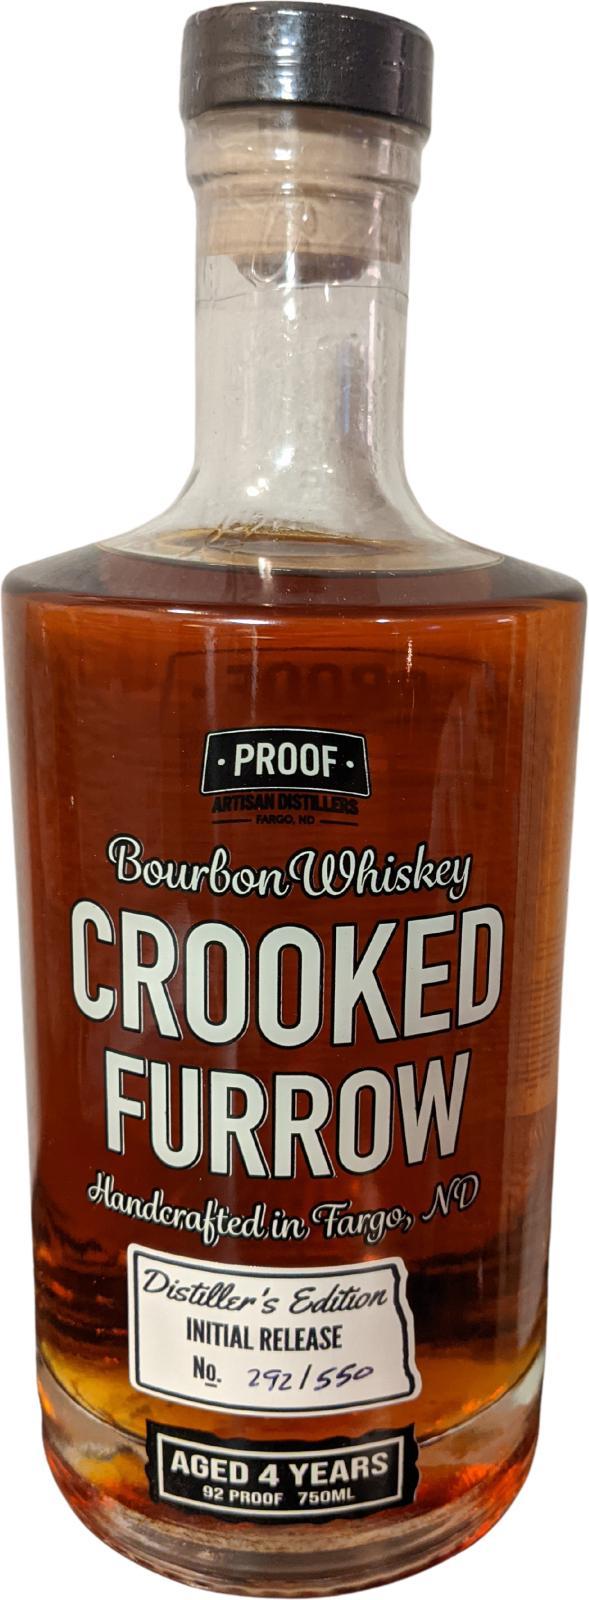 Crooked Furrow 04-year-old